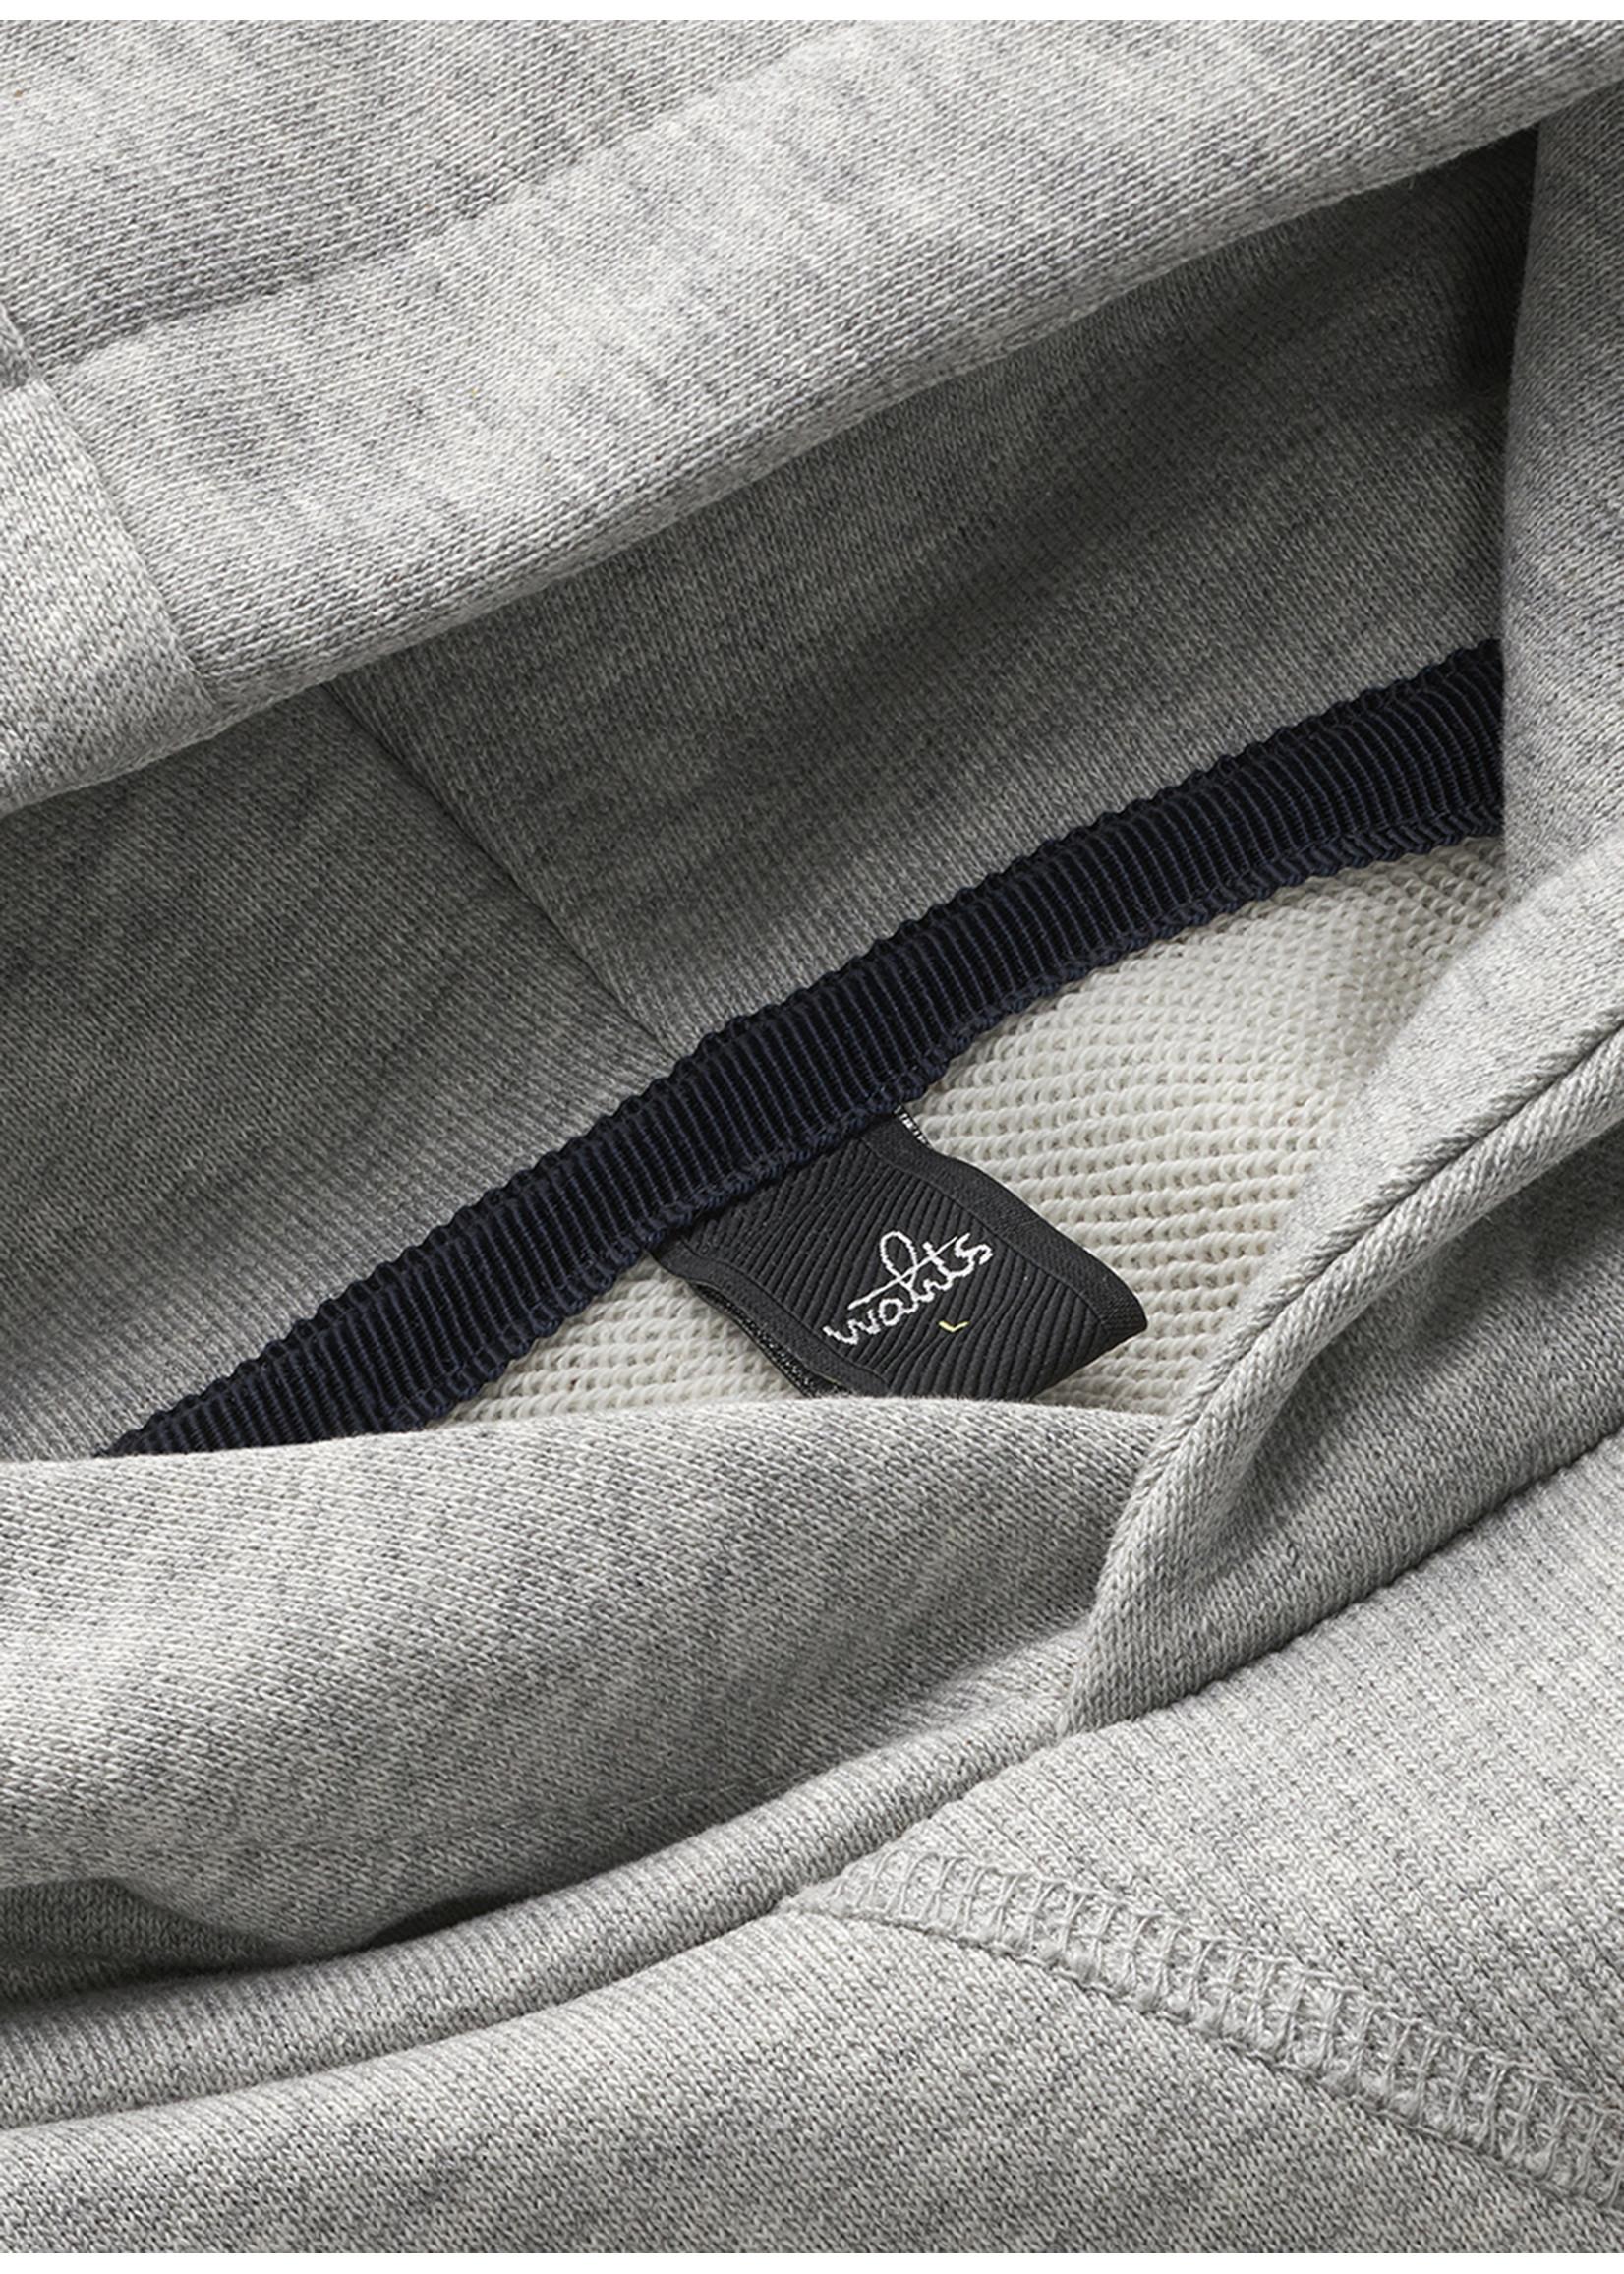 Wahts Vance hooded sweatshirt light grey